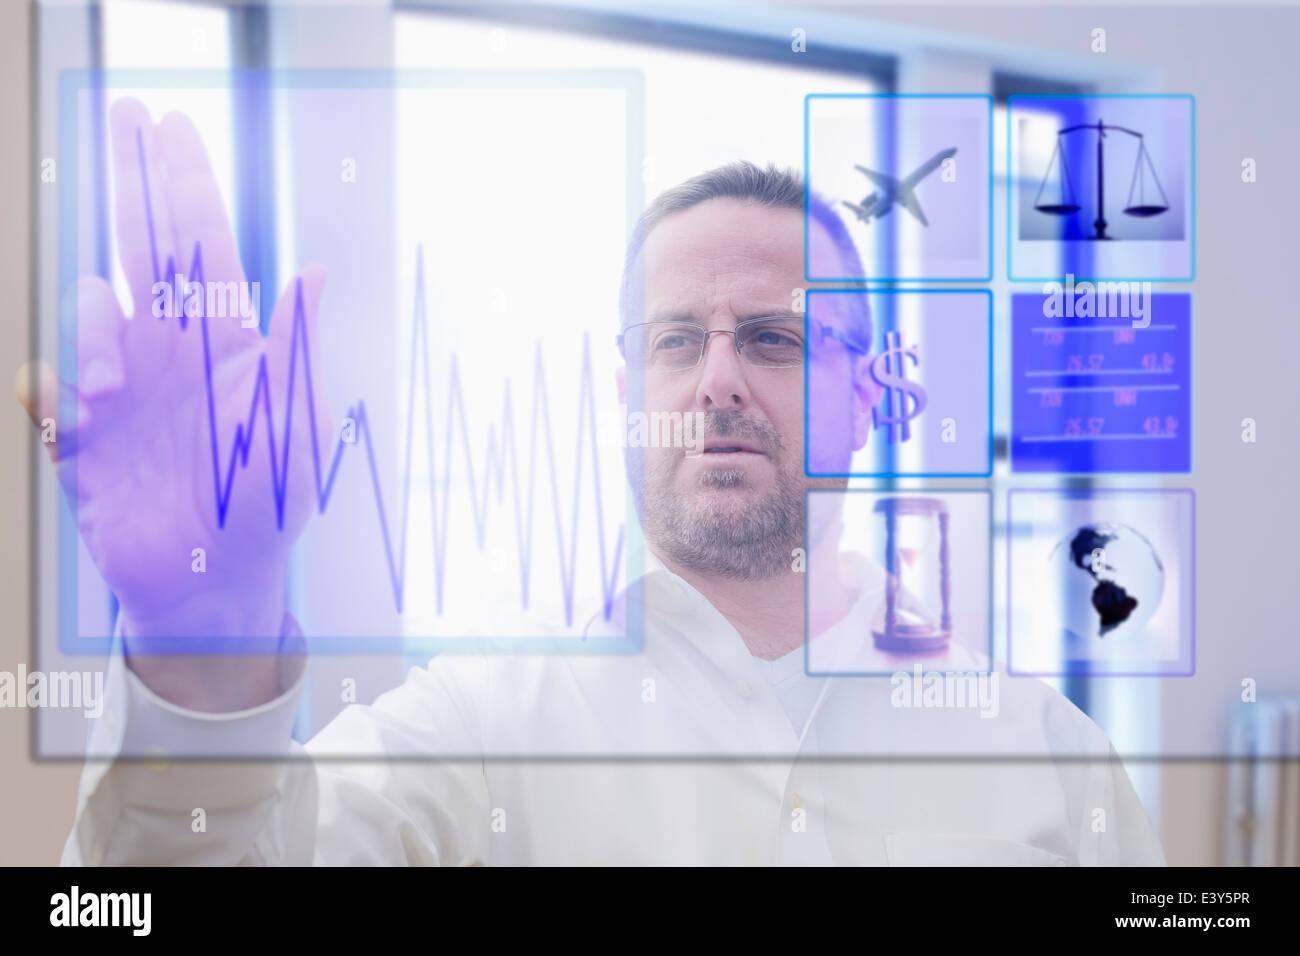 Mature man using interactive computer touchscreen - Stock Image